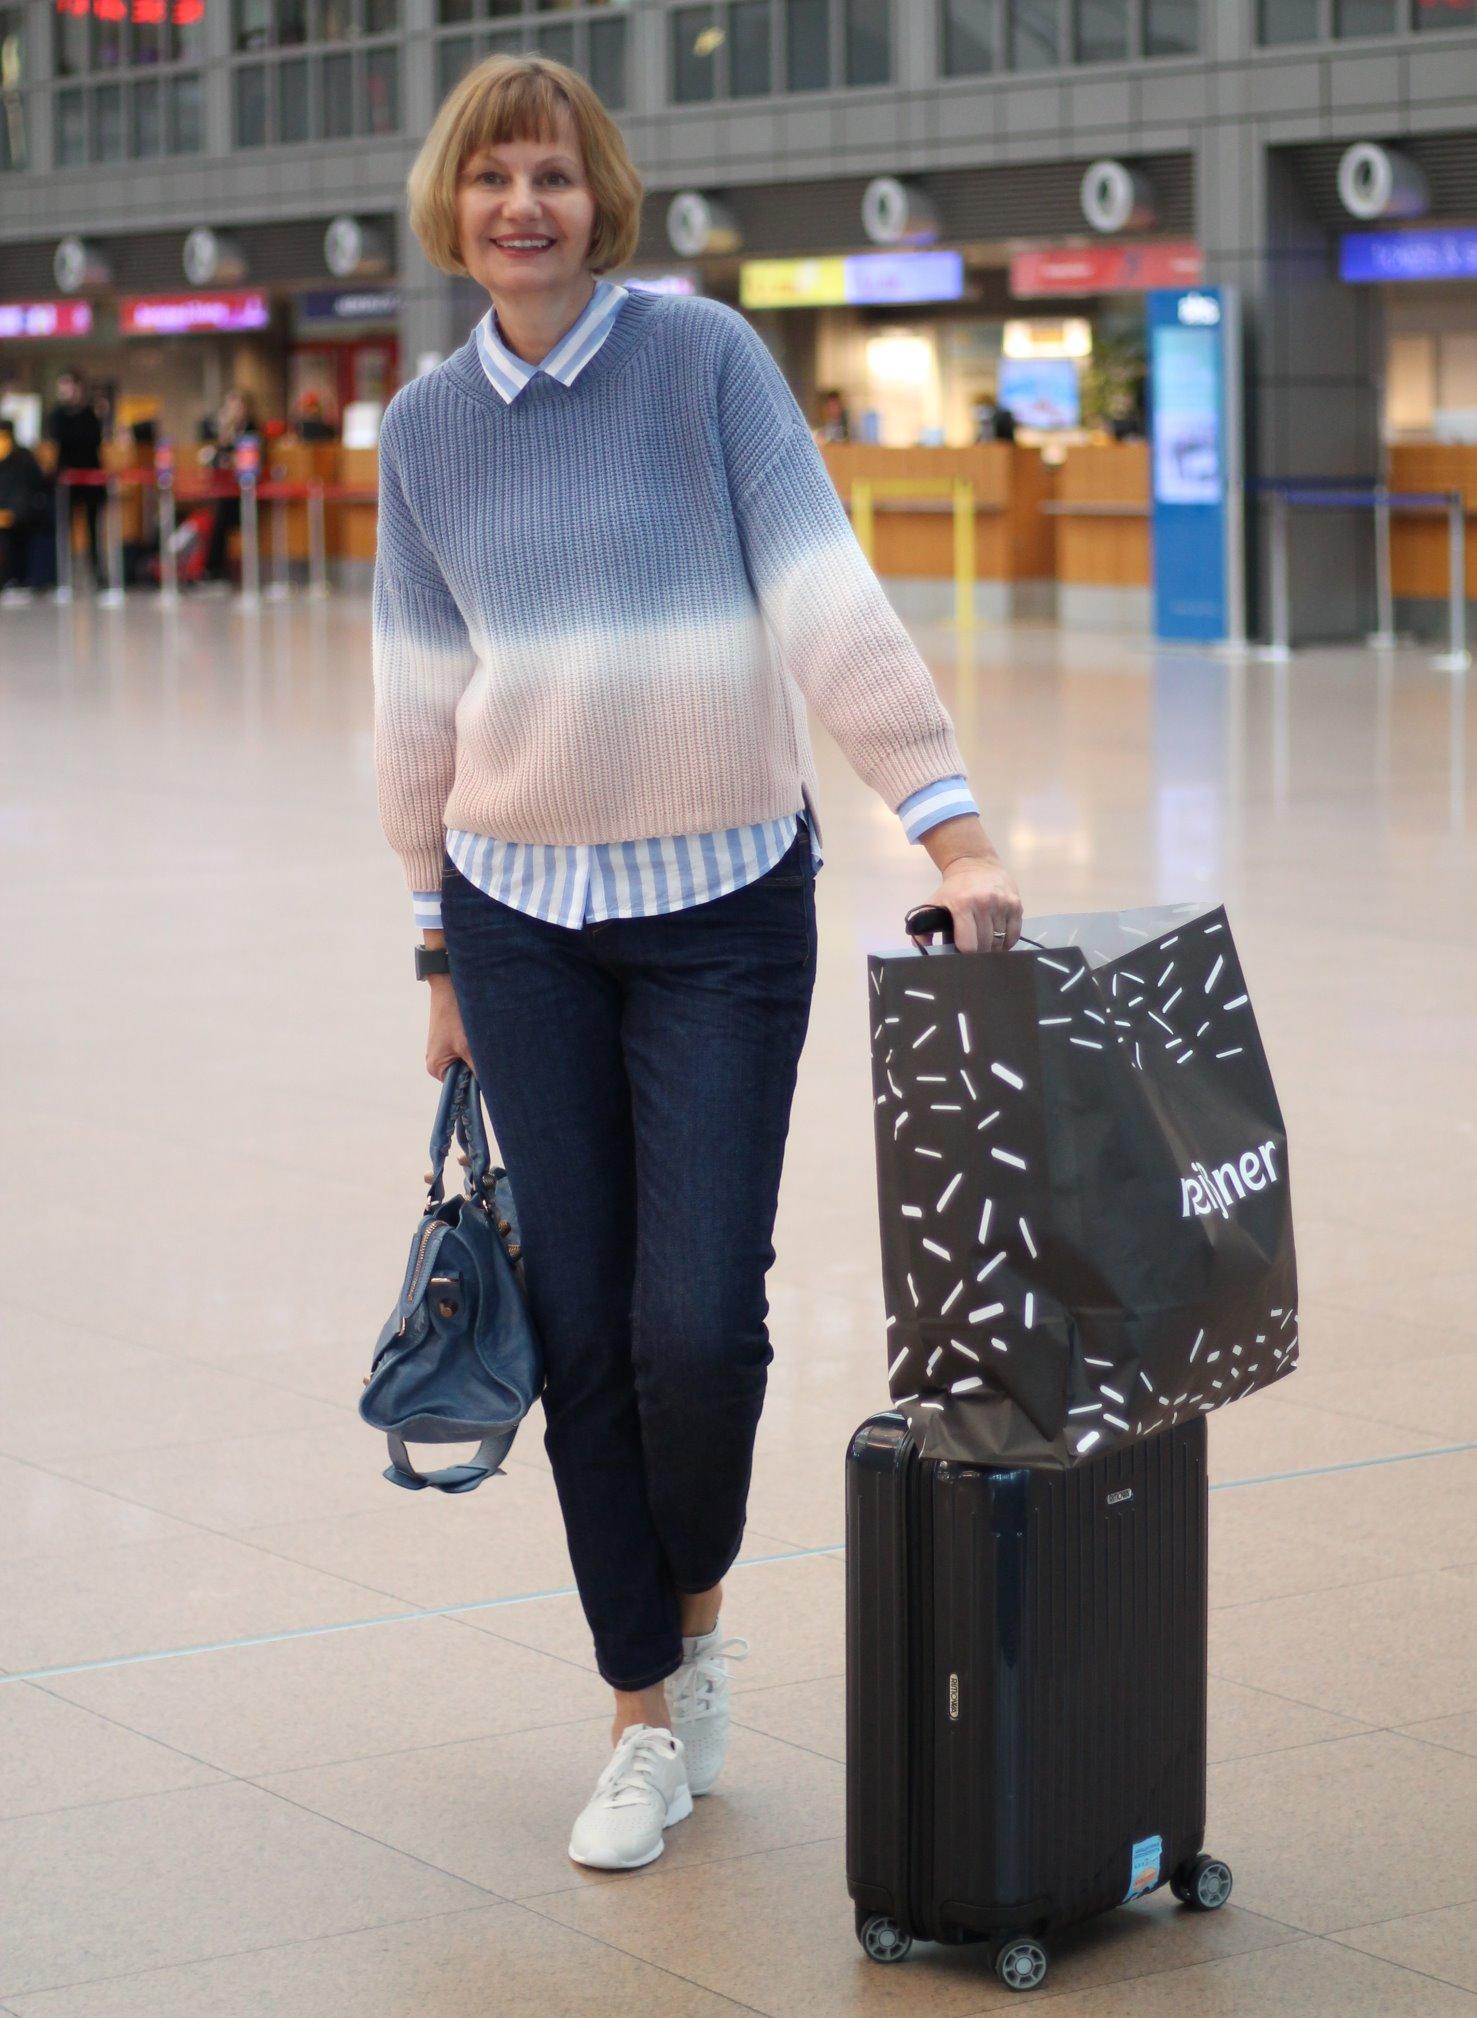 Flughafen Helmut Schmidt Hamburg